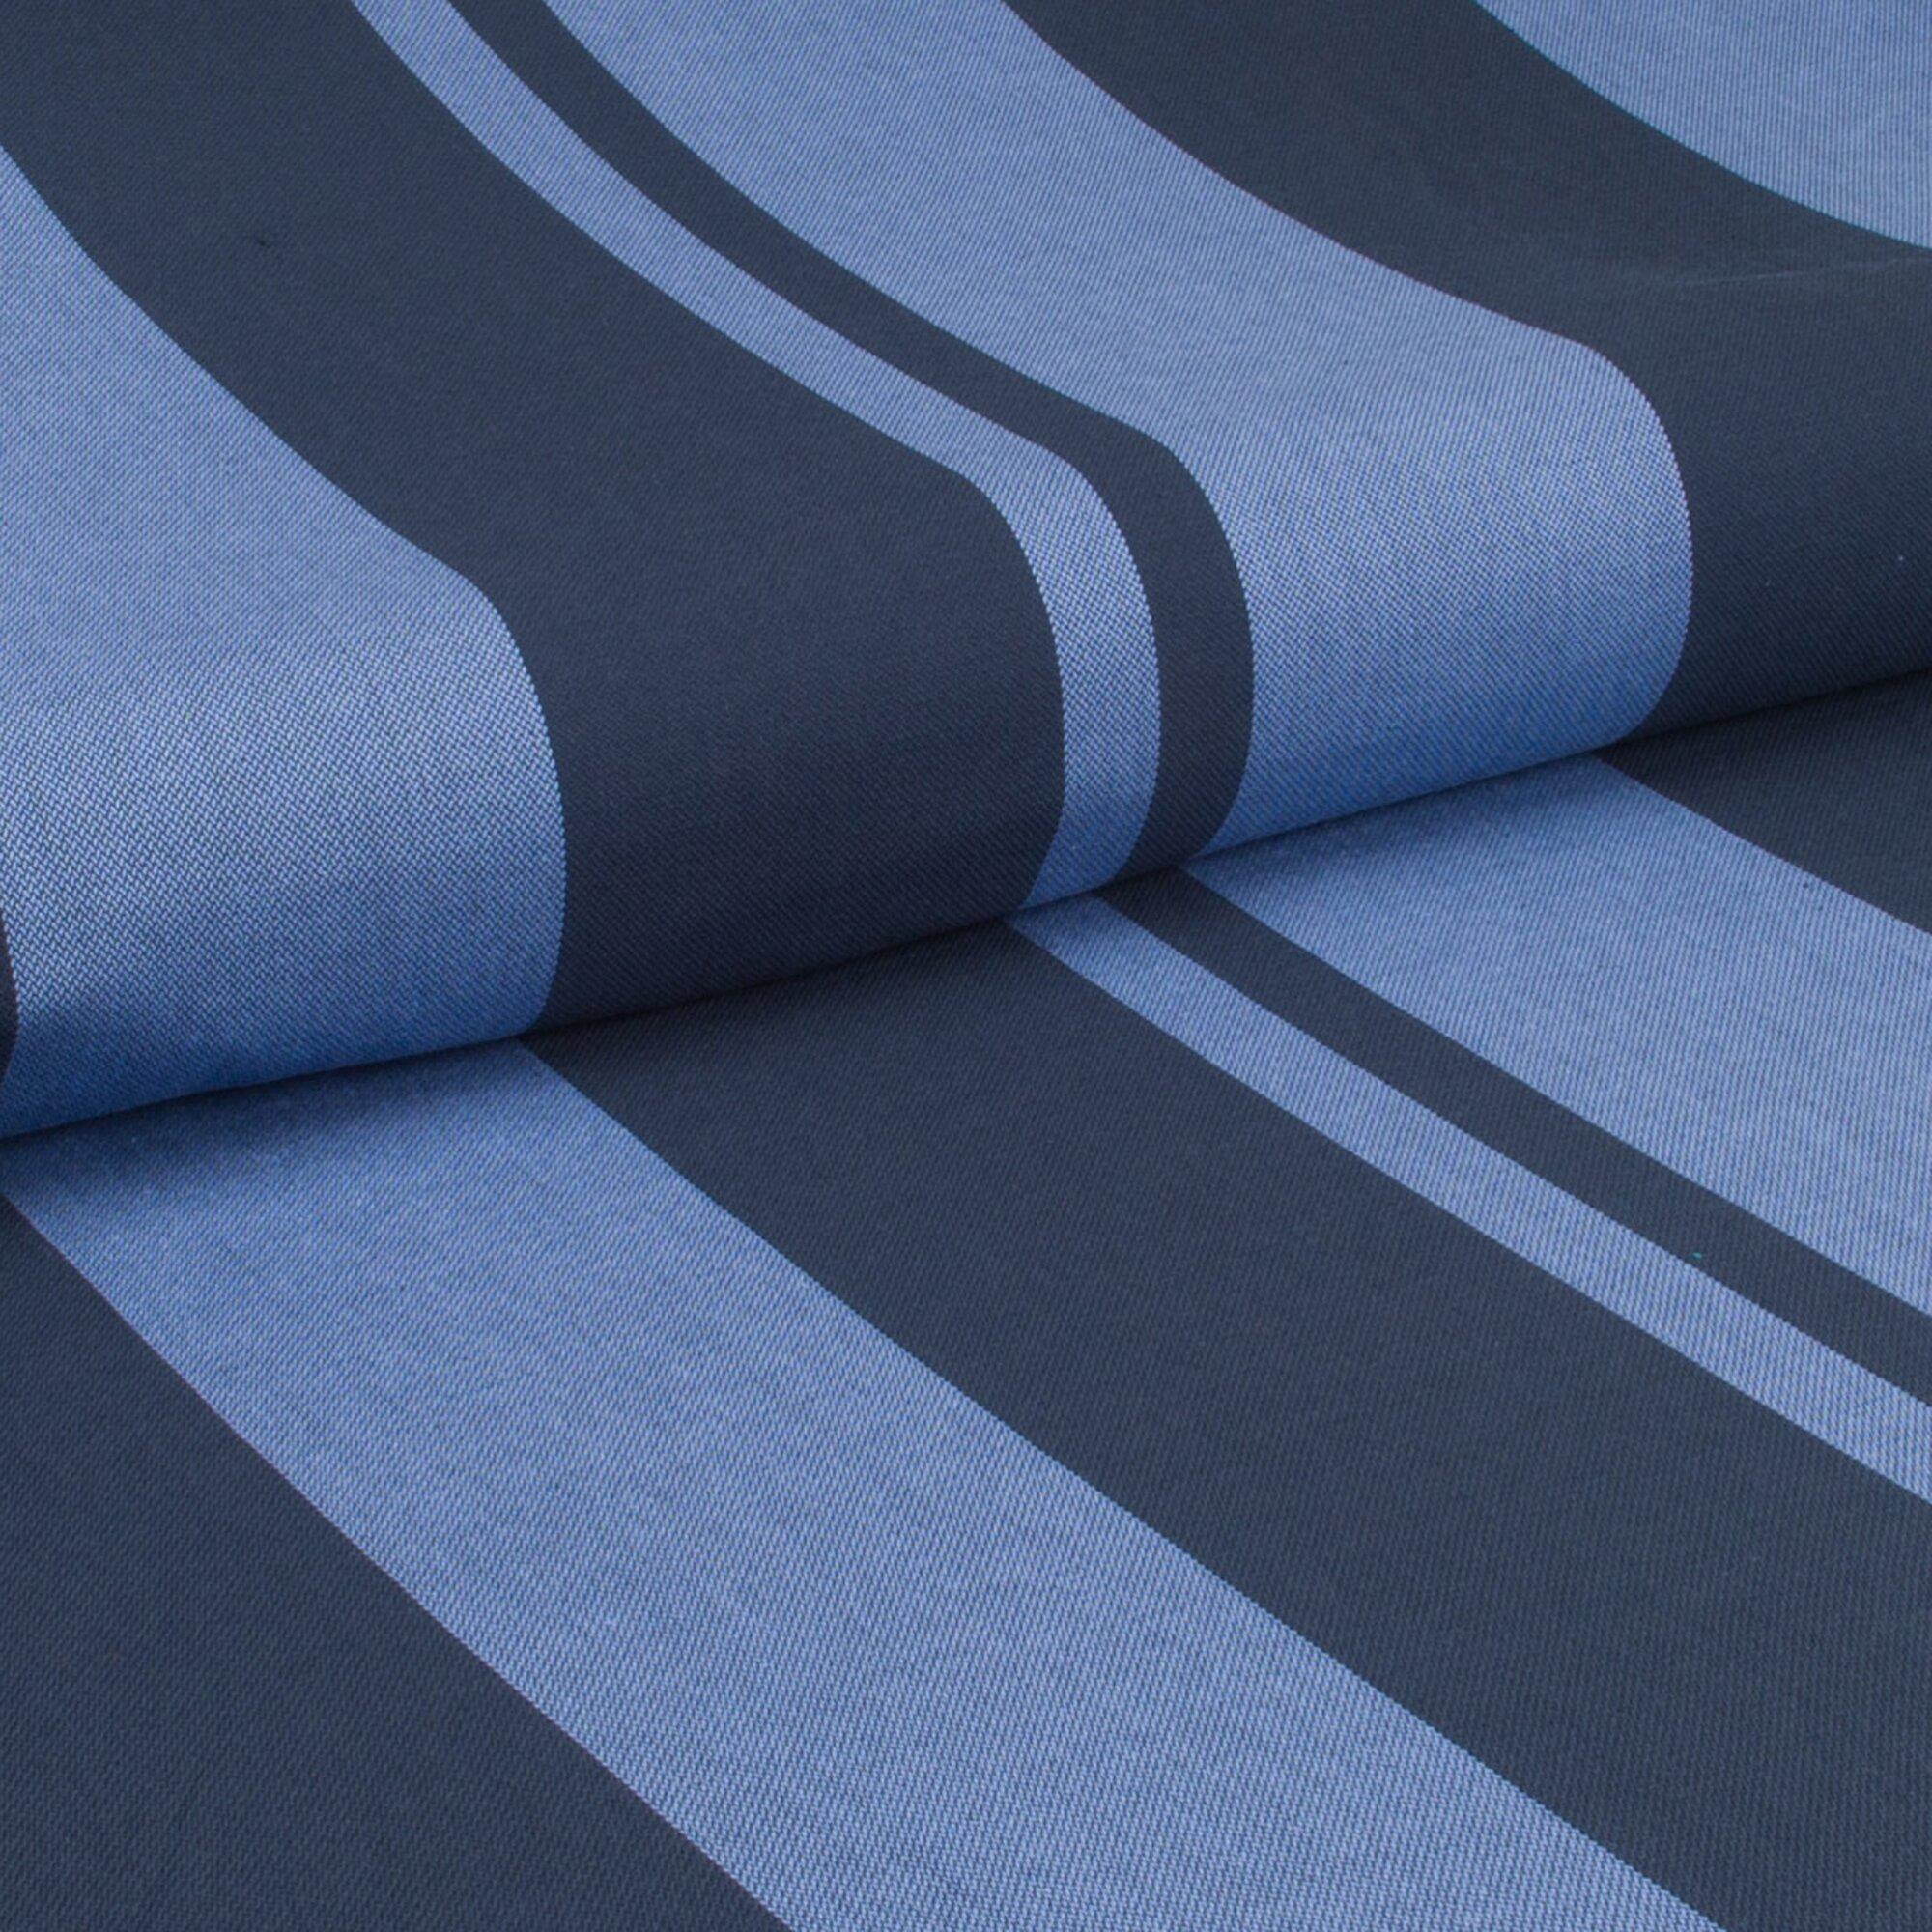 easymaxx-hoppediz-tragetuch-mit-streifen-blau